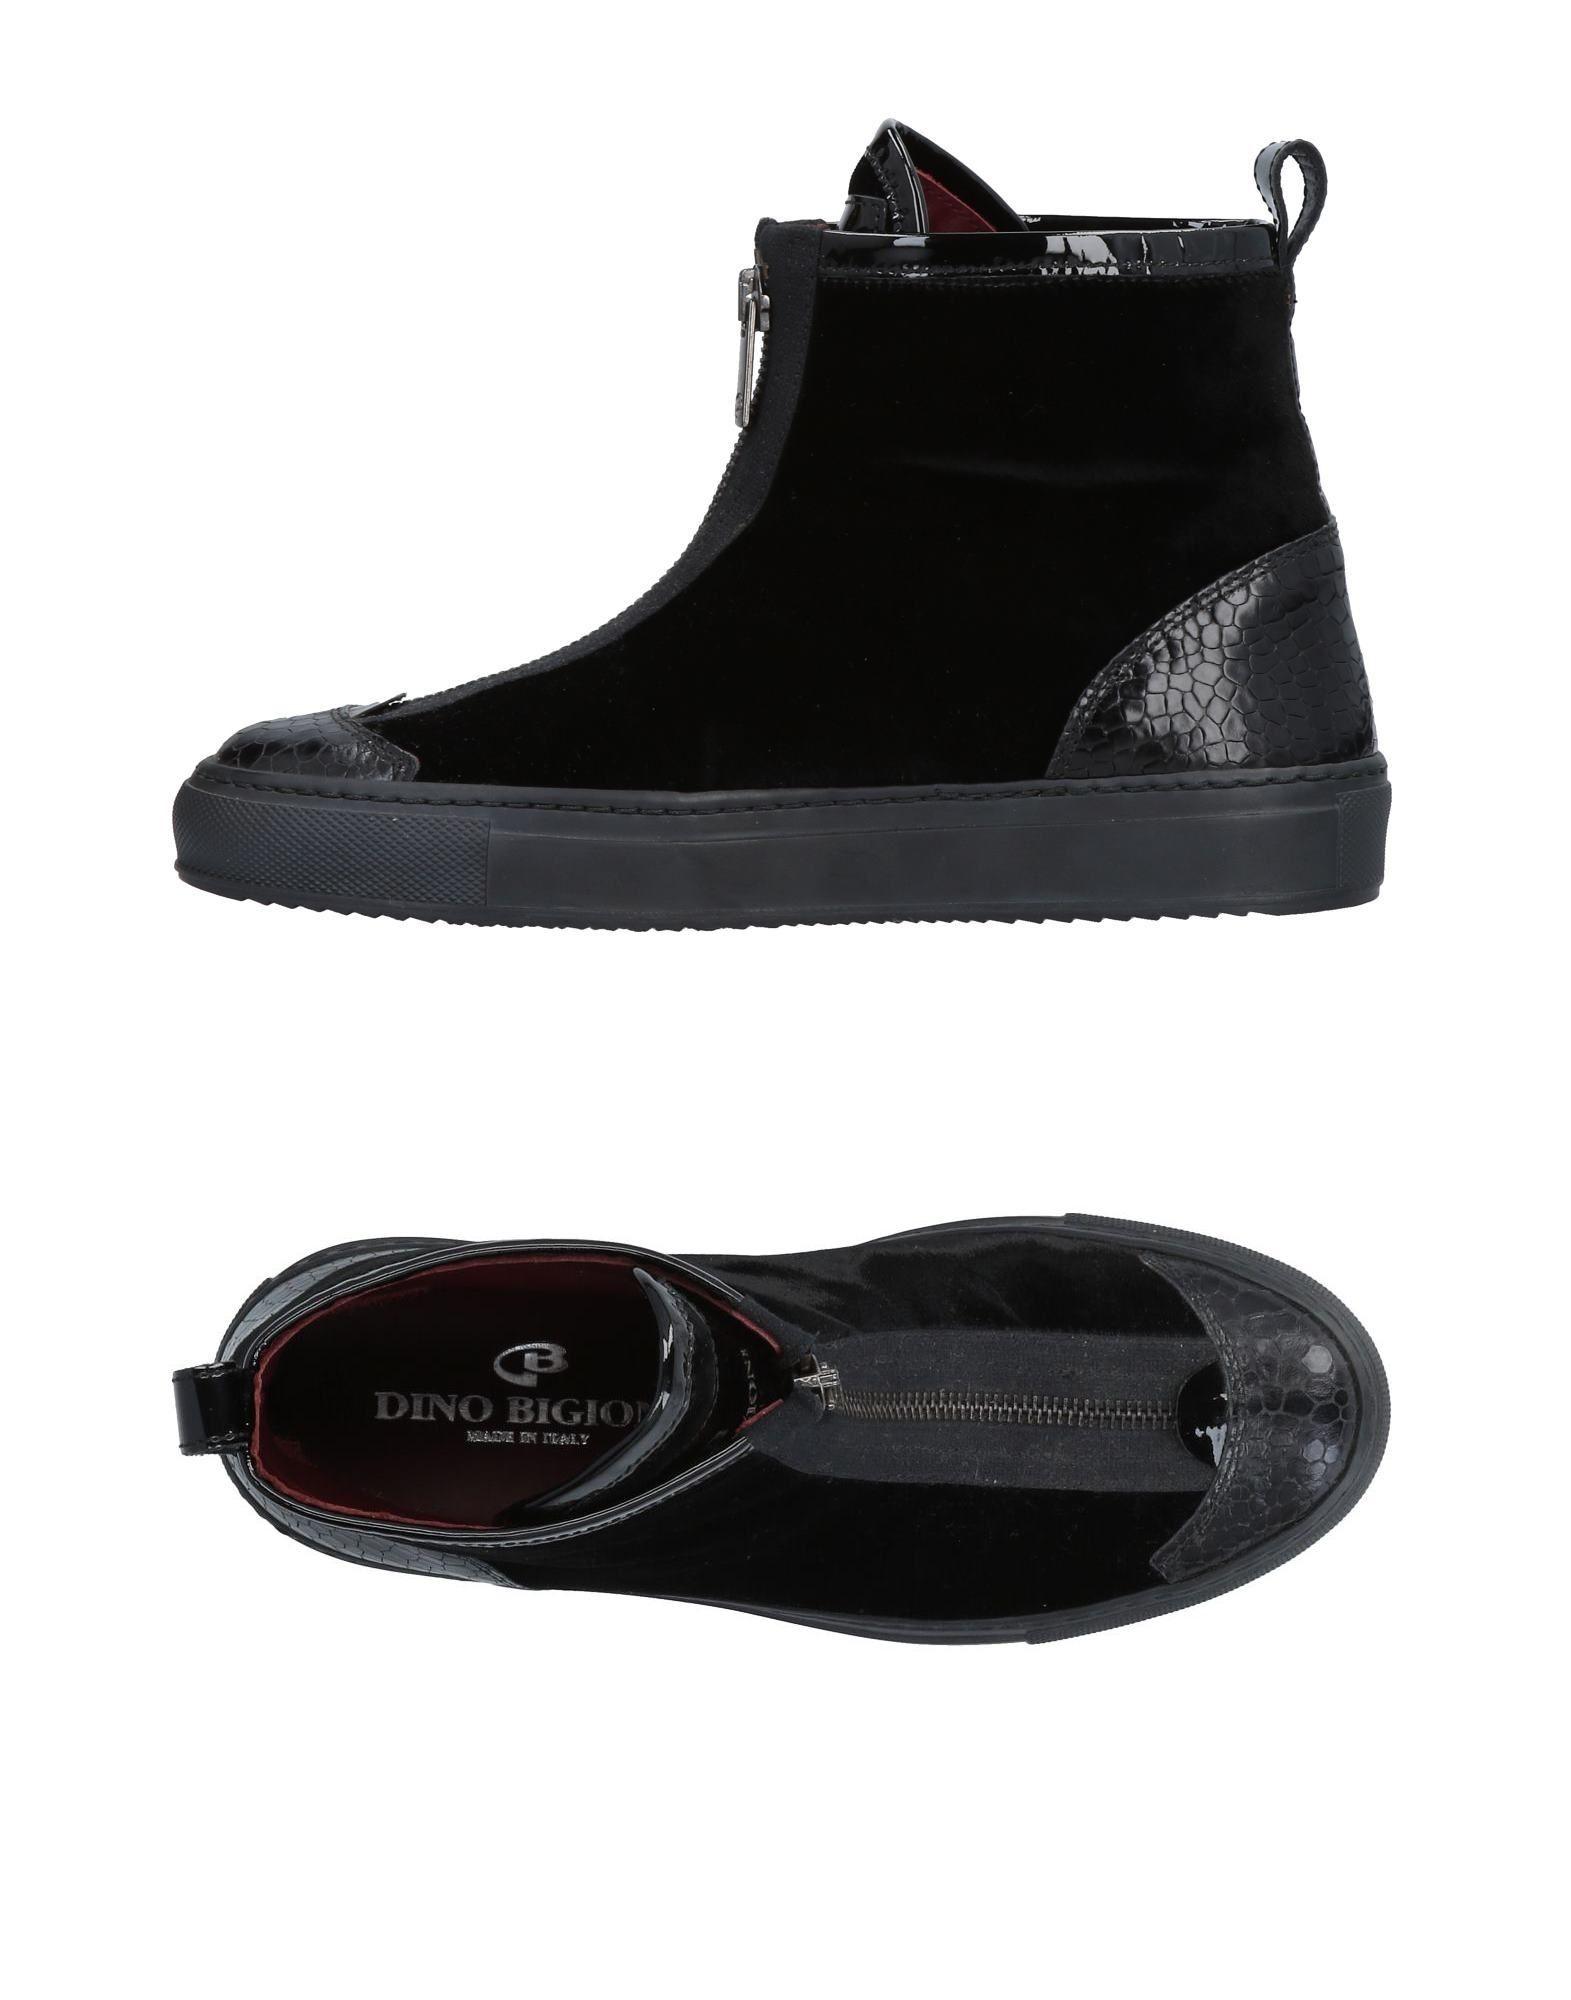 Dino Bigioni Sneakers Damen beliebte  11473059FU Gute Qualität beliebte Damen Schuhe 19ef40